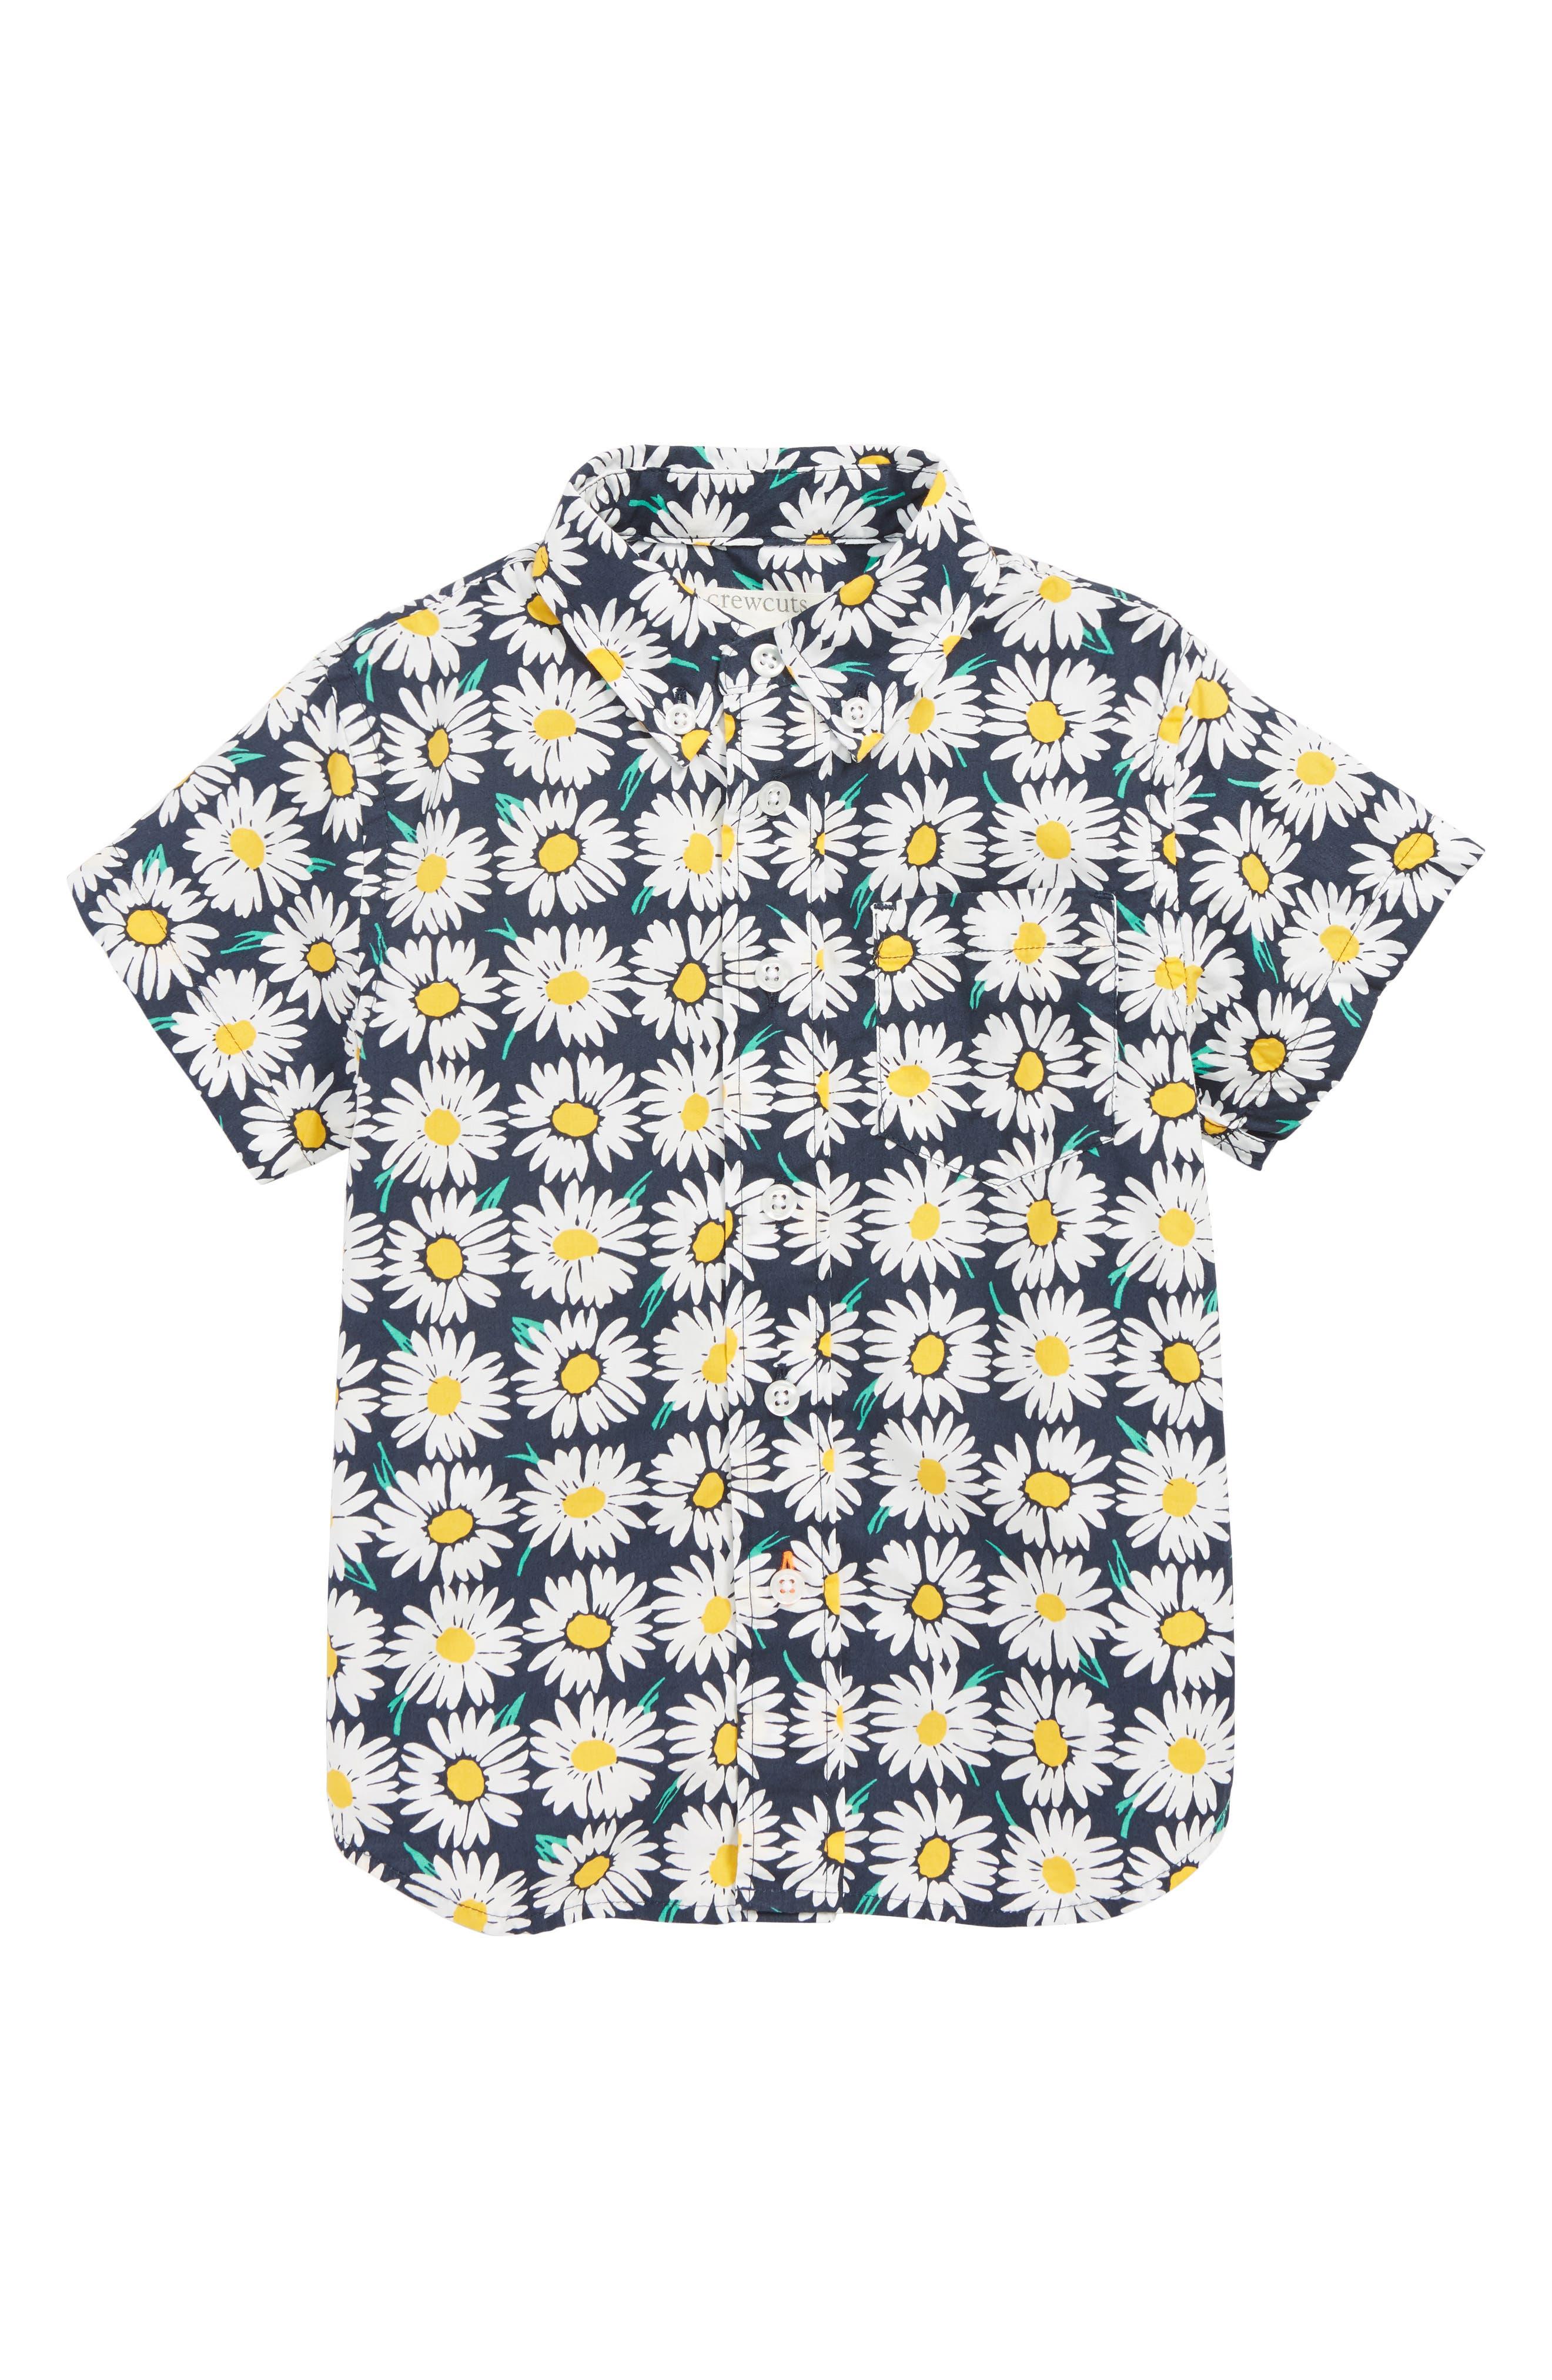 CREWCUTS BY J.CREW Stretch Poplin Button Down Shirt, Main, color, CHECKERBOARD DAISY